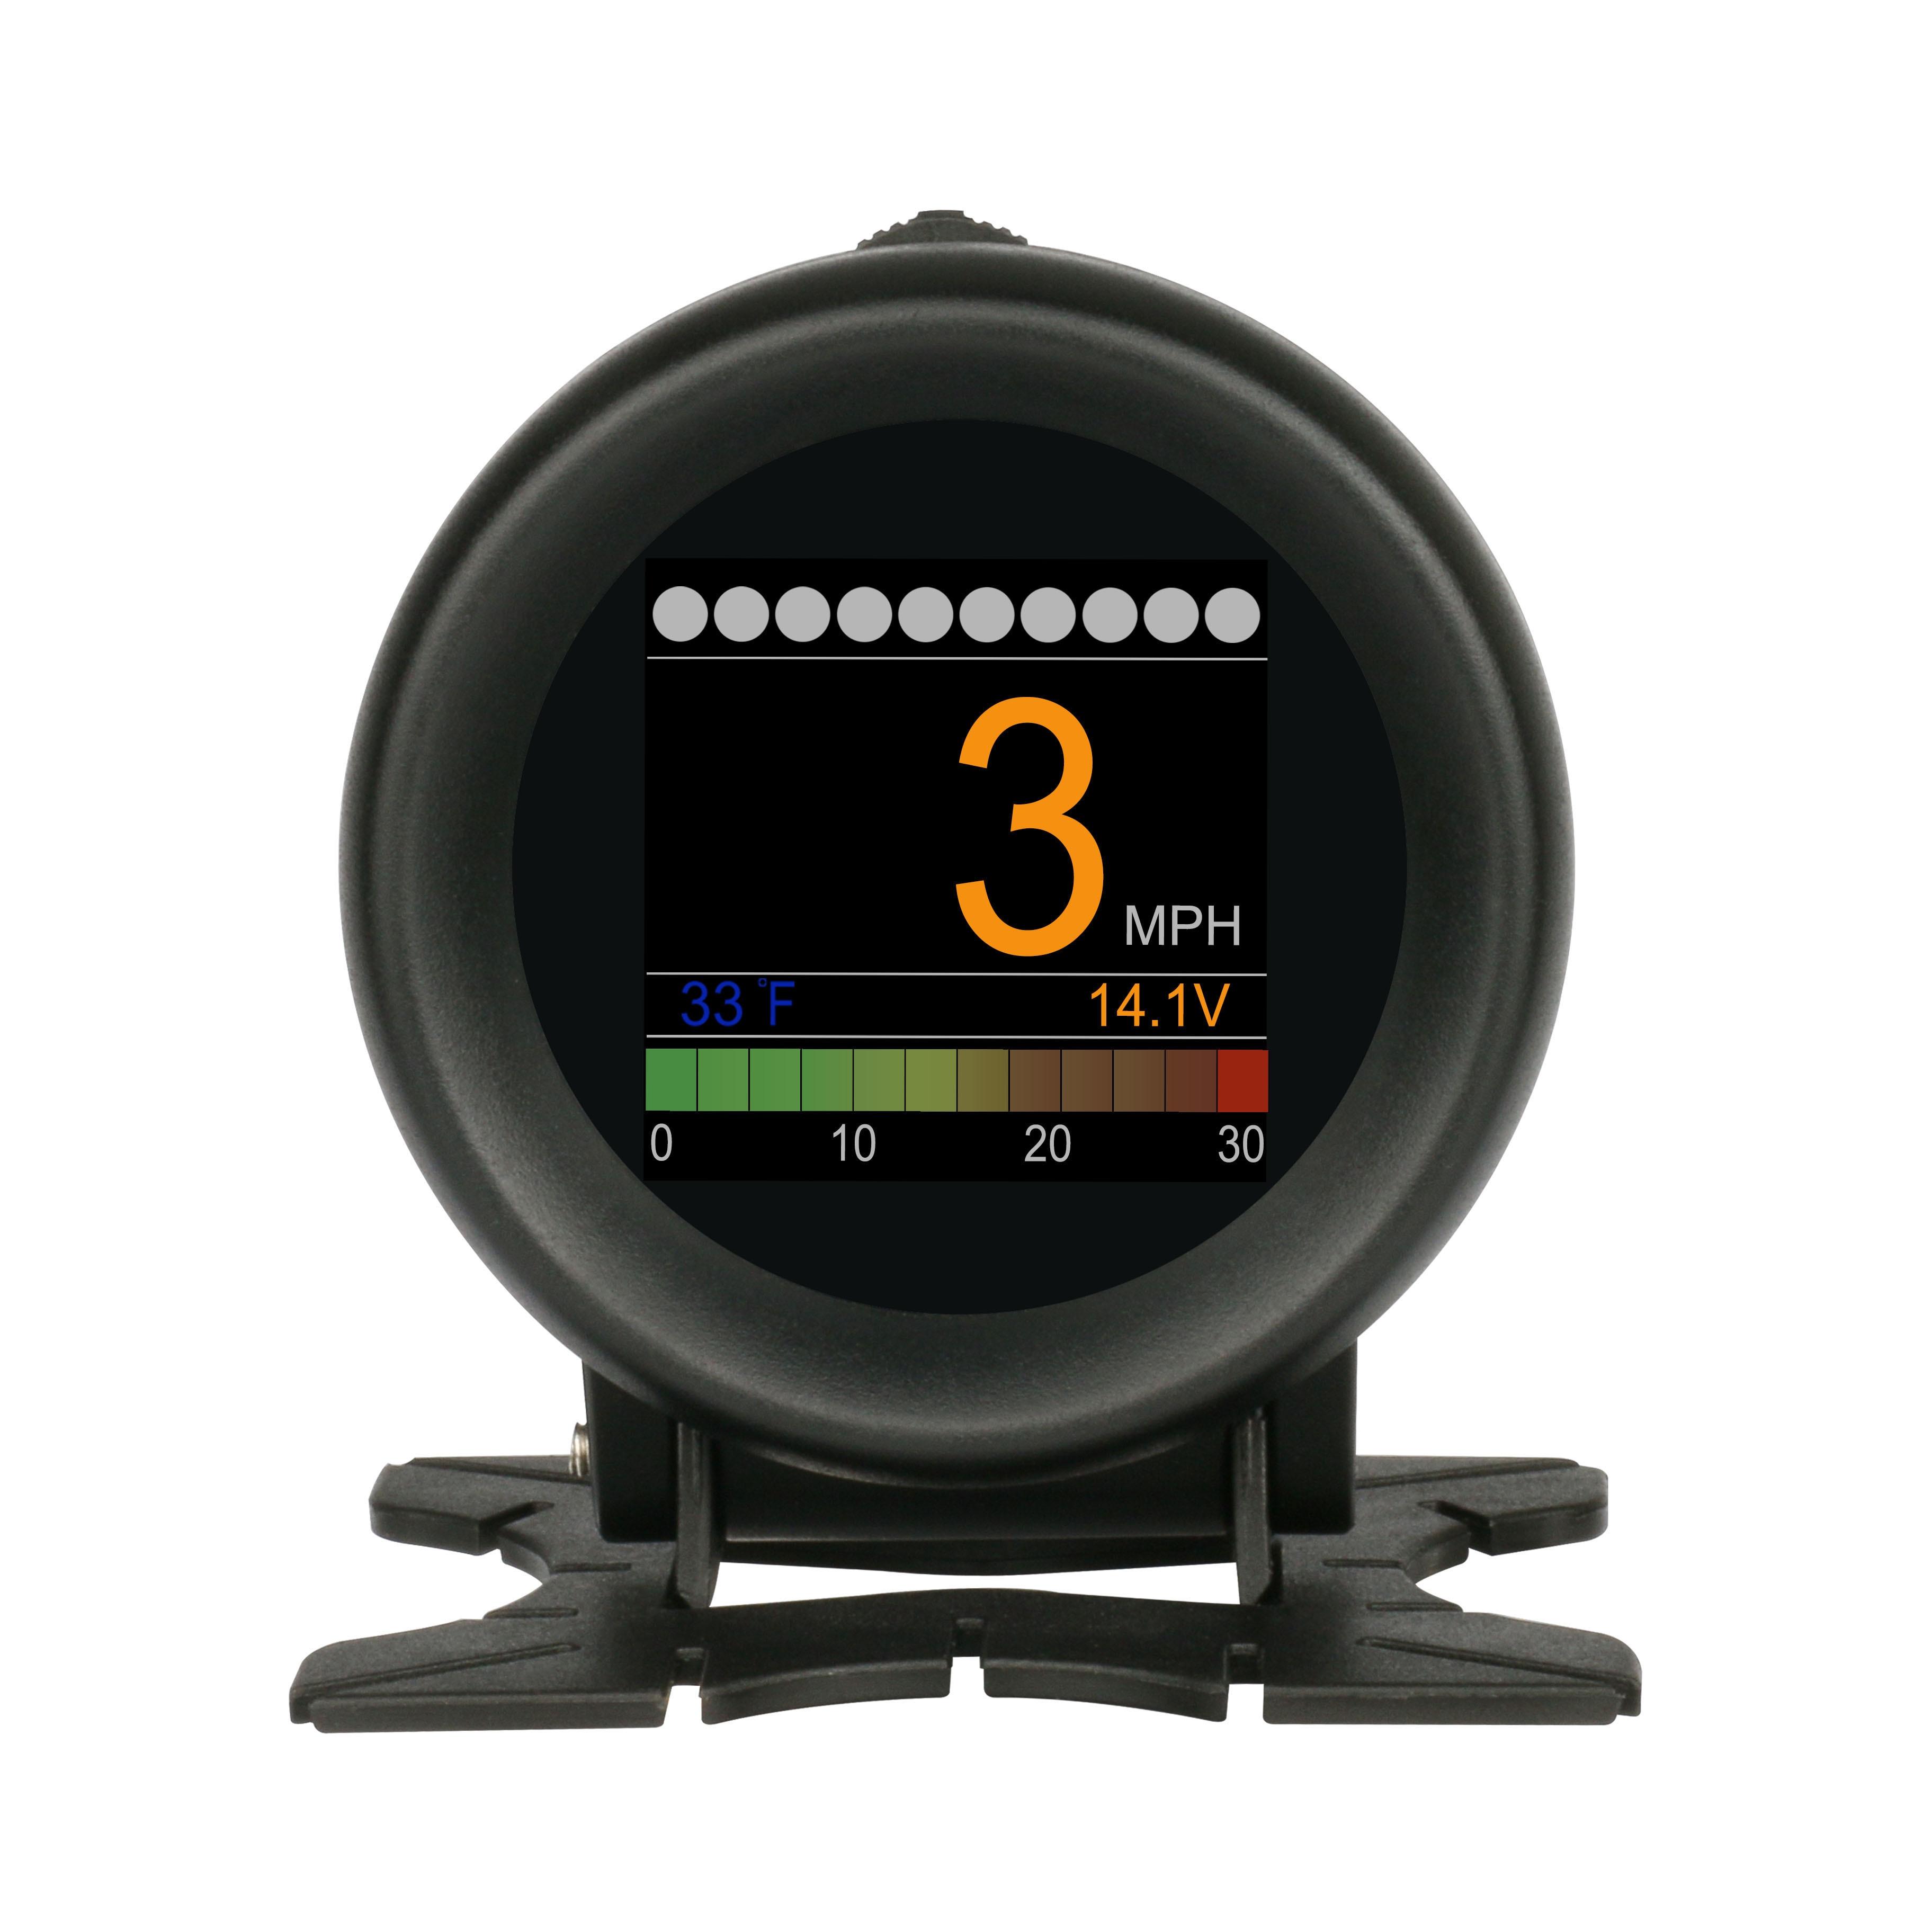 Car Electronics Autool X60 Car Obd Multi-function Digital Meter Alarm Speed Water-temp Gauge Malfunction-test For 12v Obd-ii Standard Vehicle